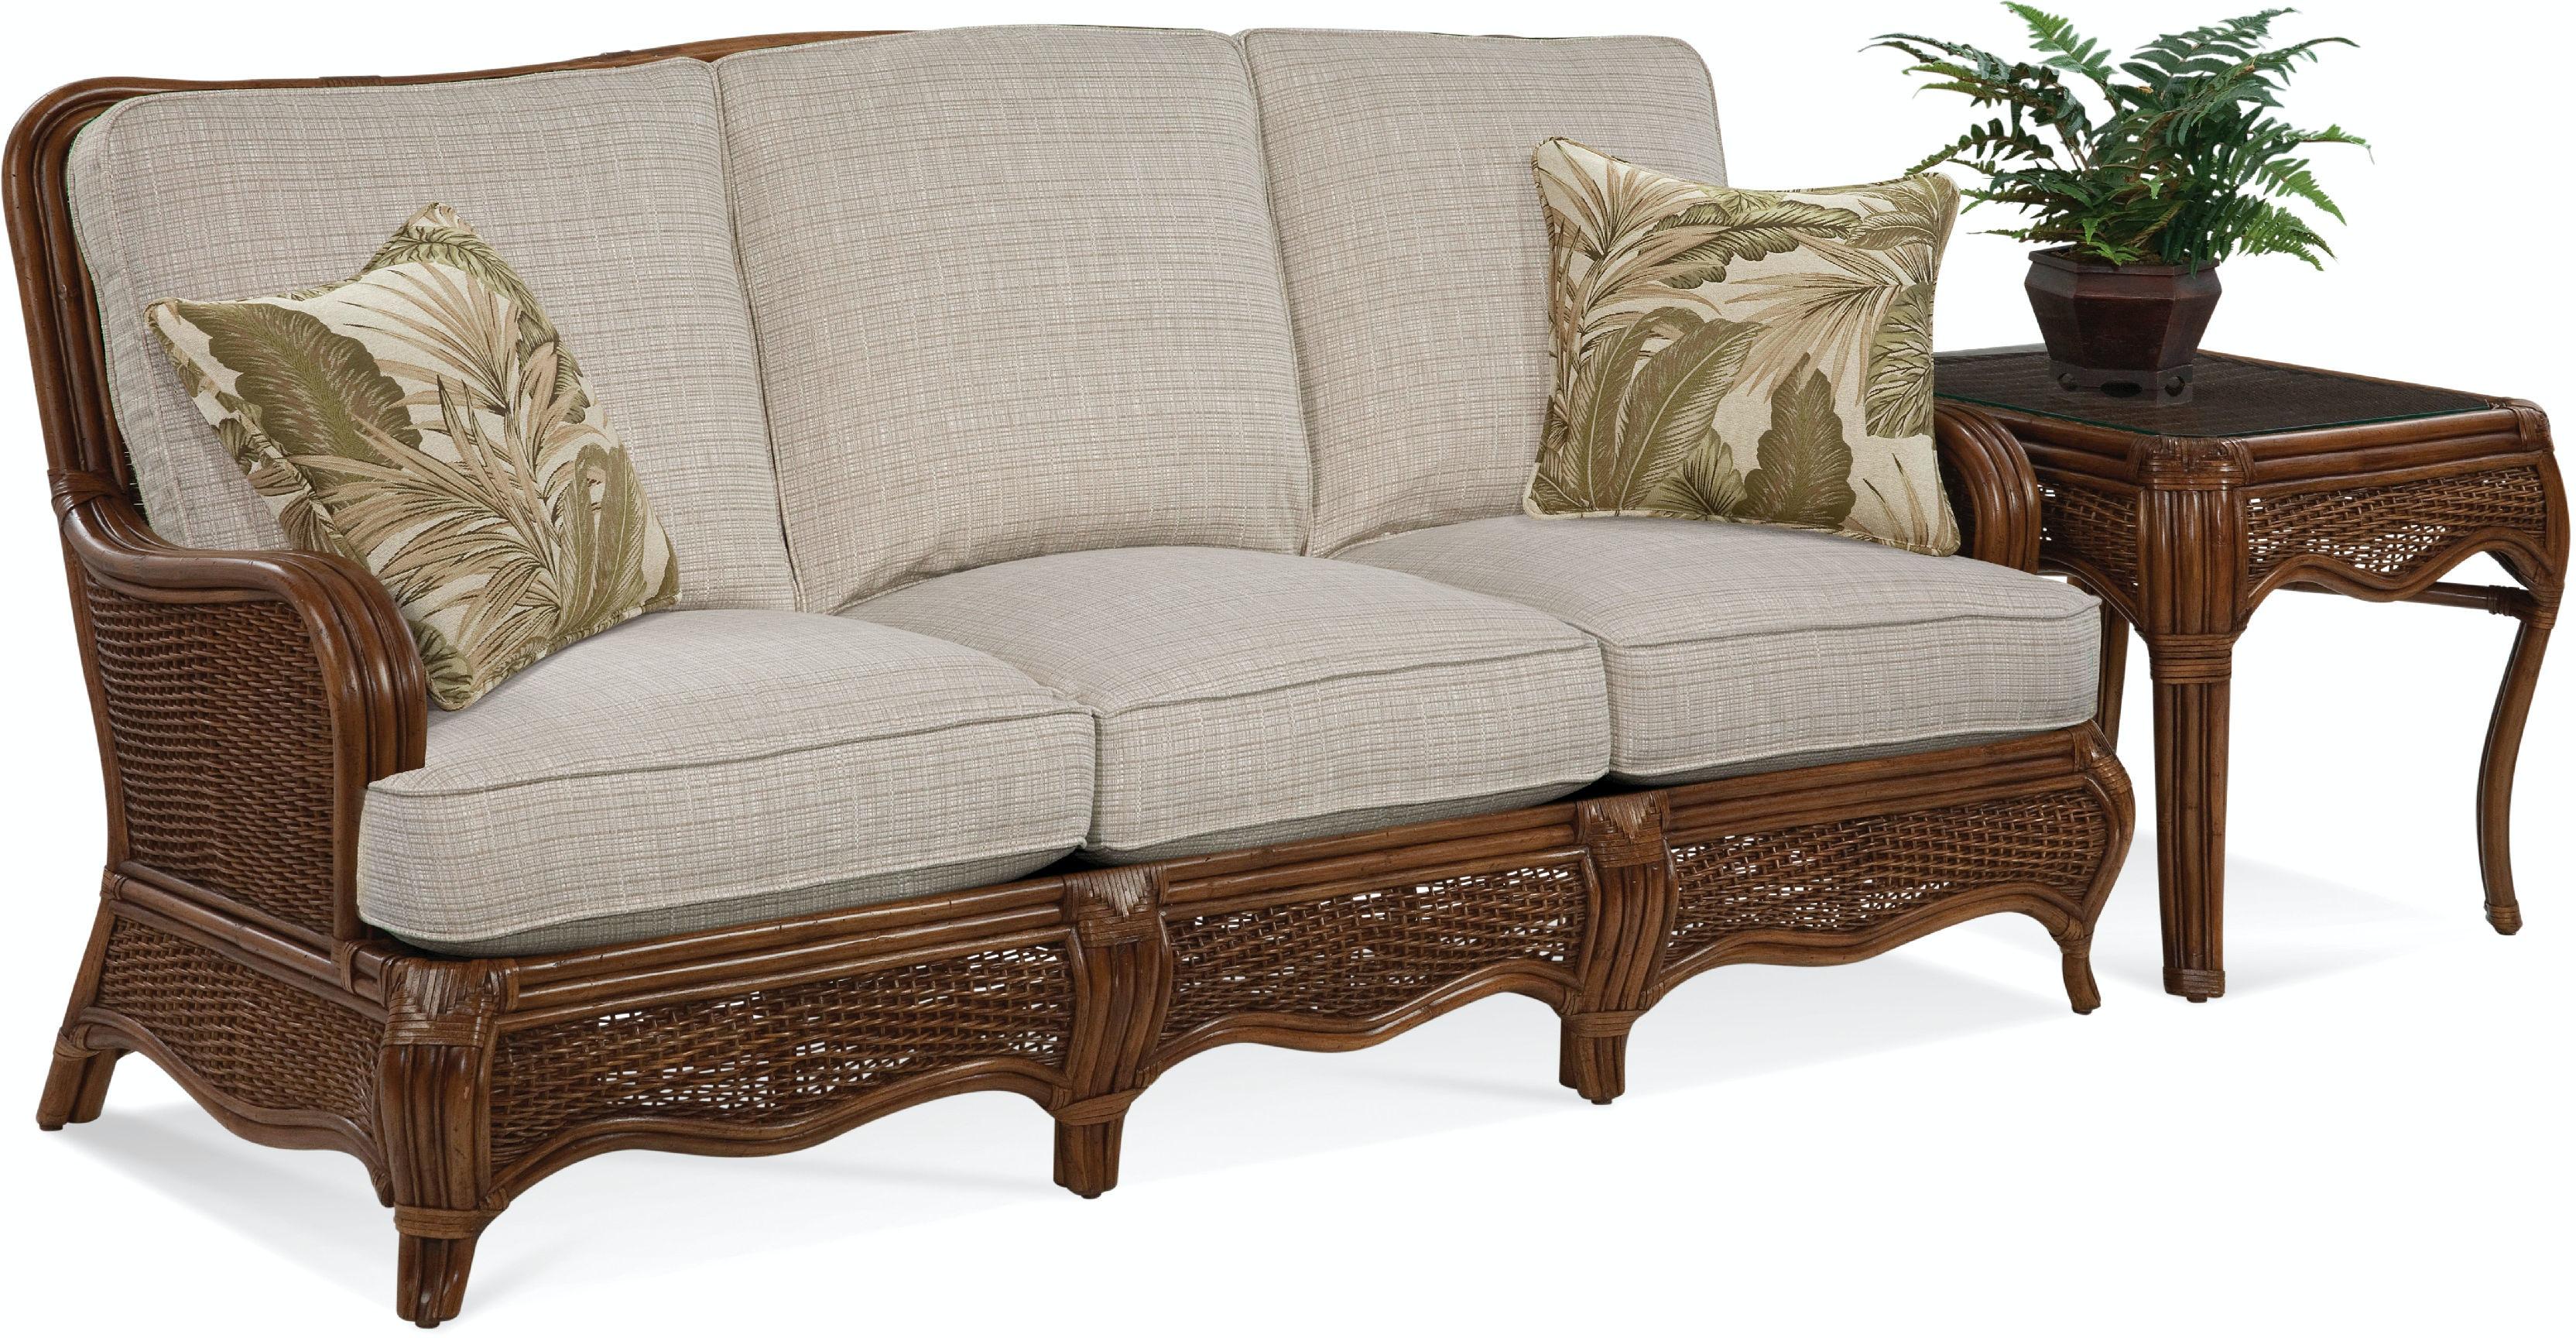 Braxton Culler Living Room Sofa 1910 011 Kalin Home